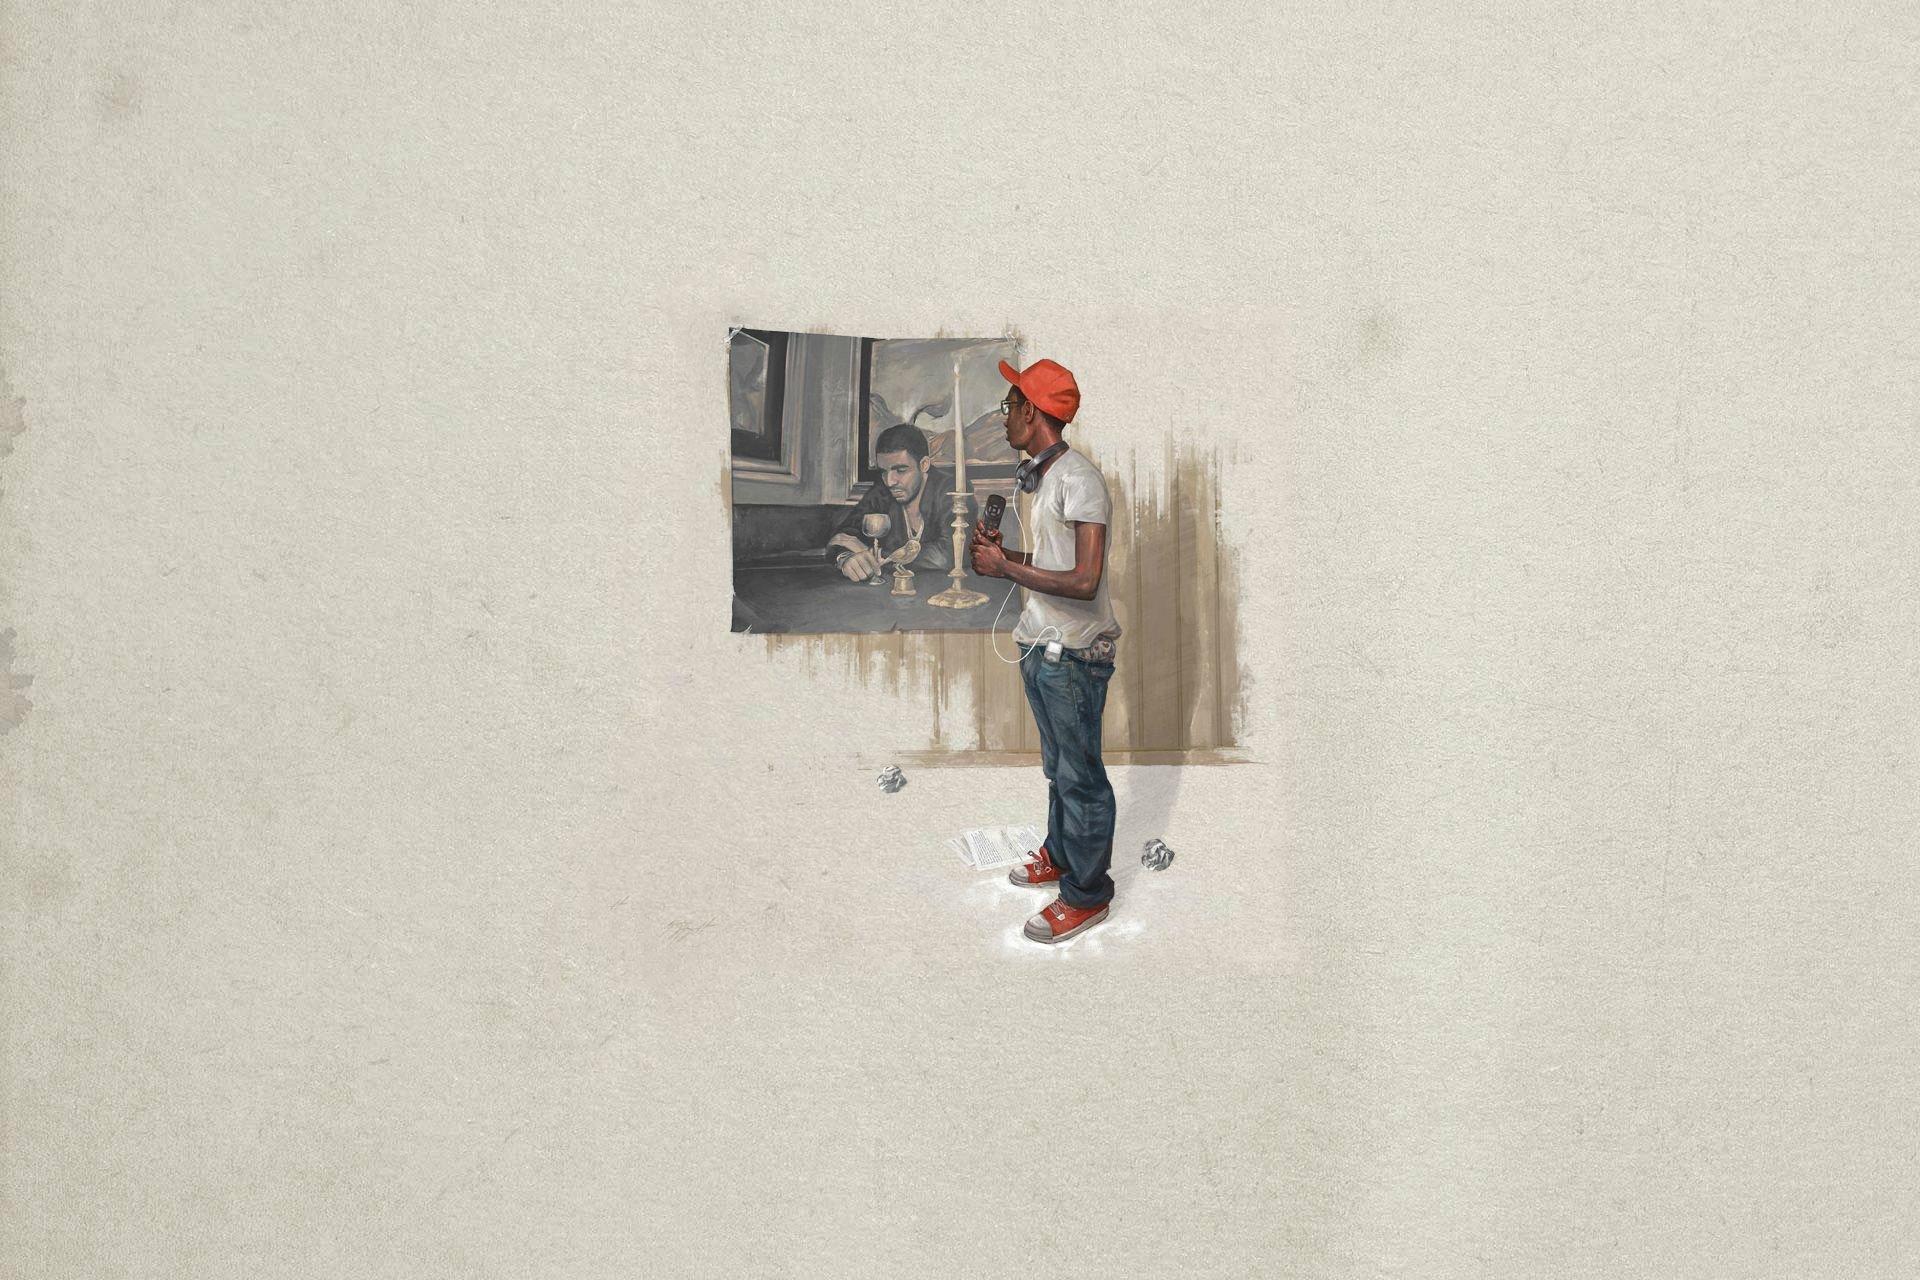 rap wallpaper hd 1920x1280 256875